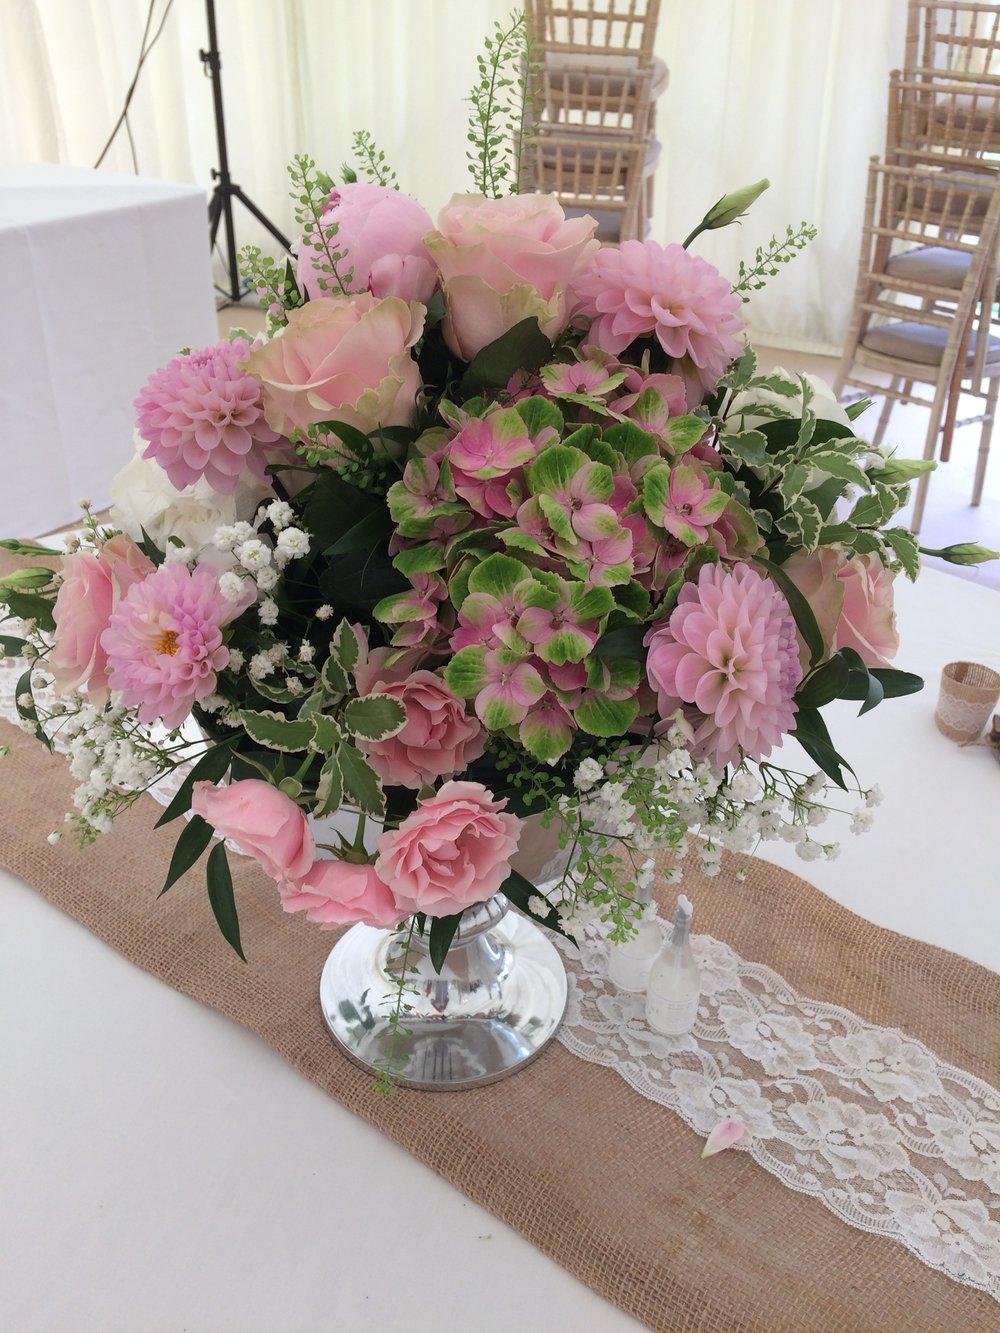 Sue Davies Flowers - Venue FlowersSue Davies Flowers - Venue Flowers